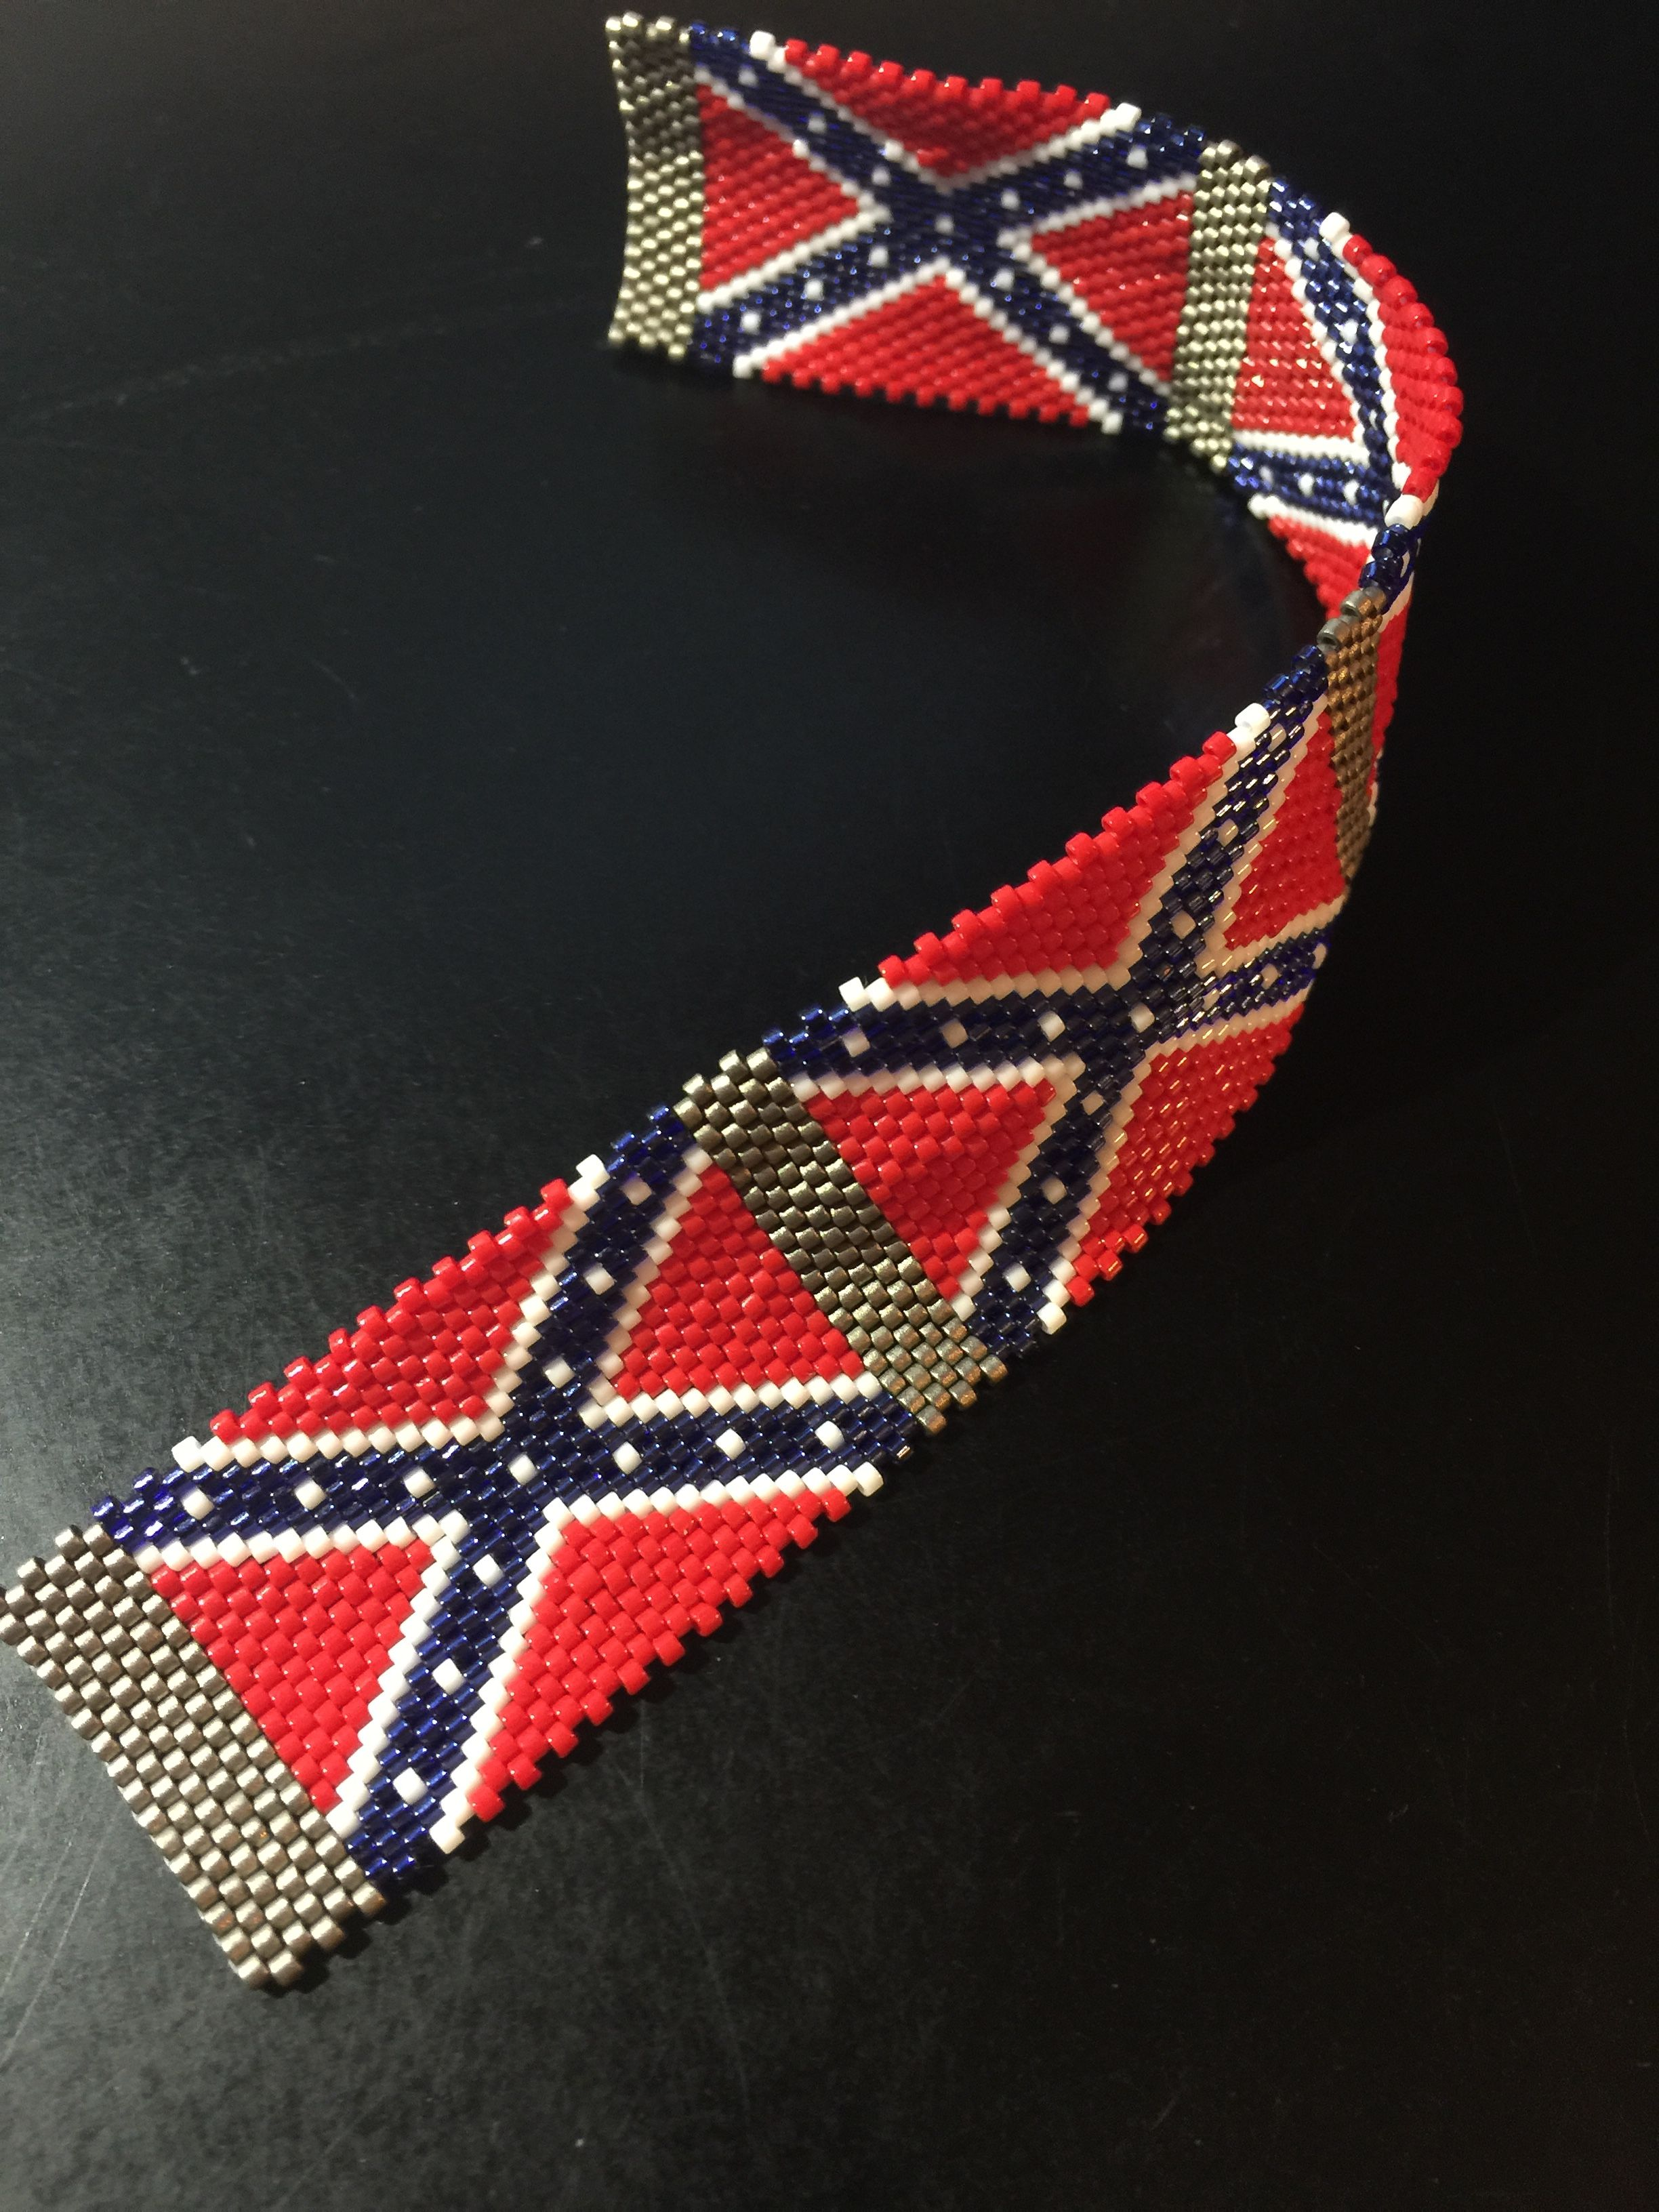 Pin On Fabric Art